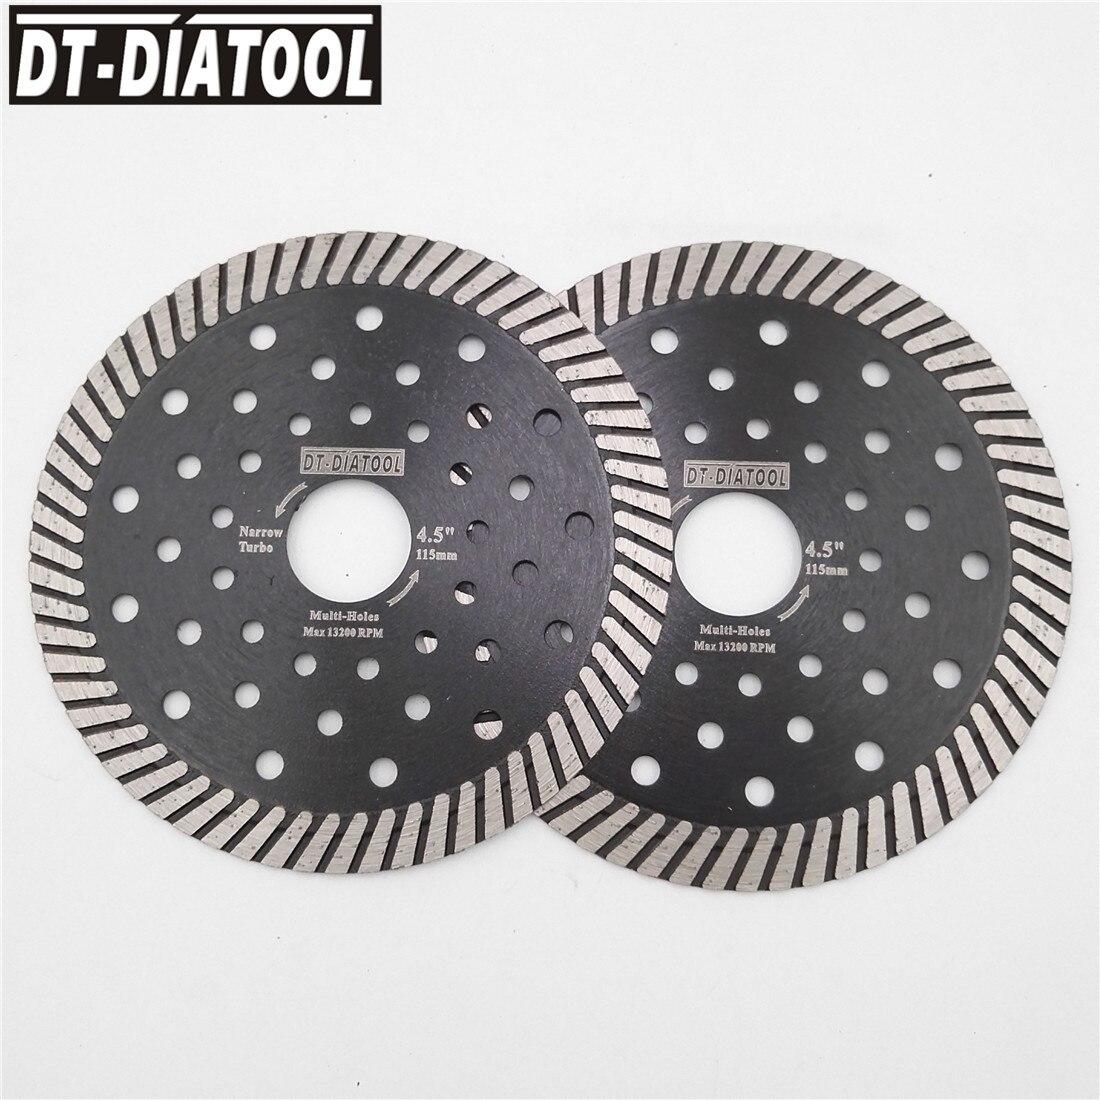 DT-DIATOOL 2pcs 4.5 Inch Diamond Hot Pressed Narrow Turbo Saw Blade Dia115MM Cutting Disc Segment With Protection Masonry